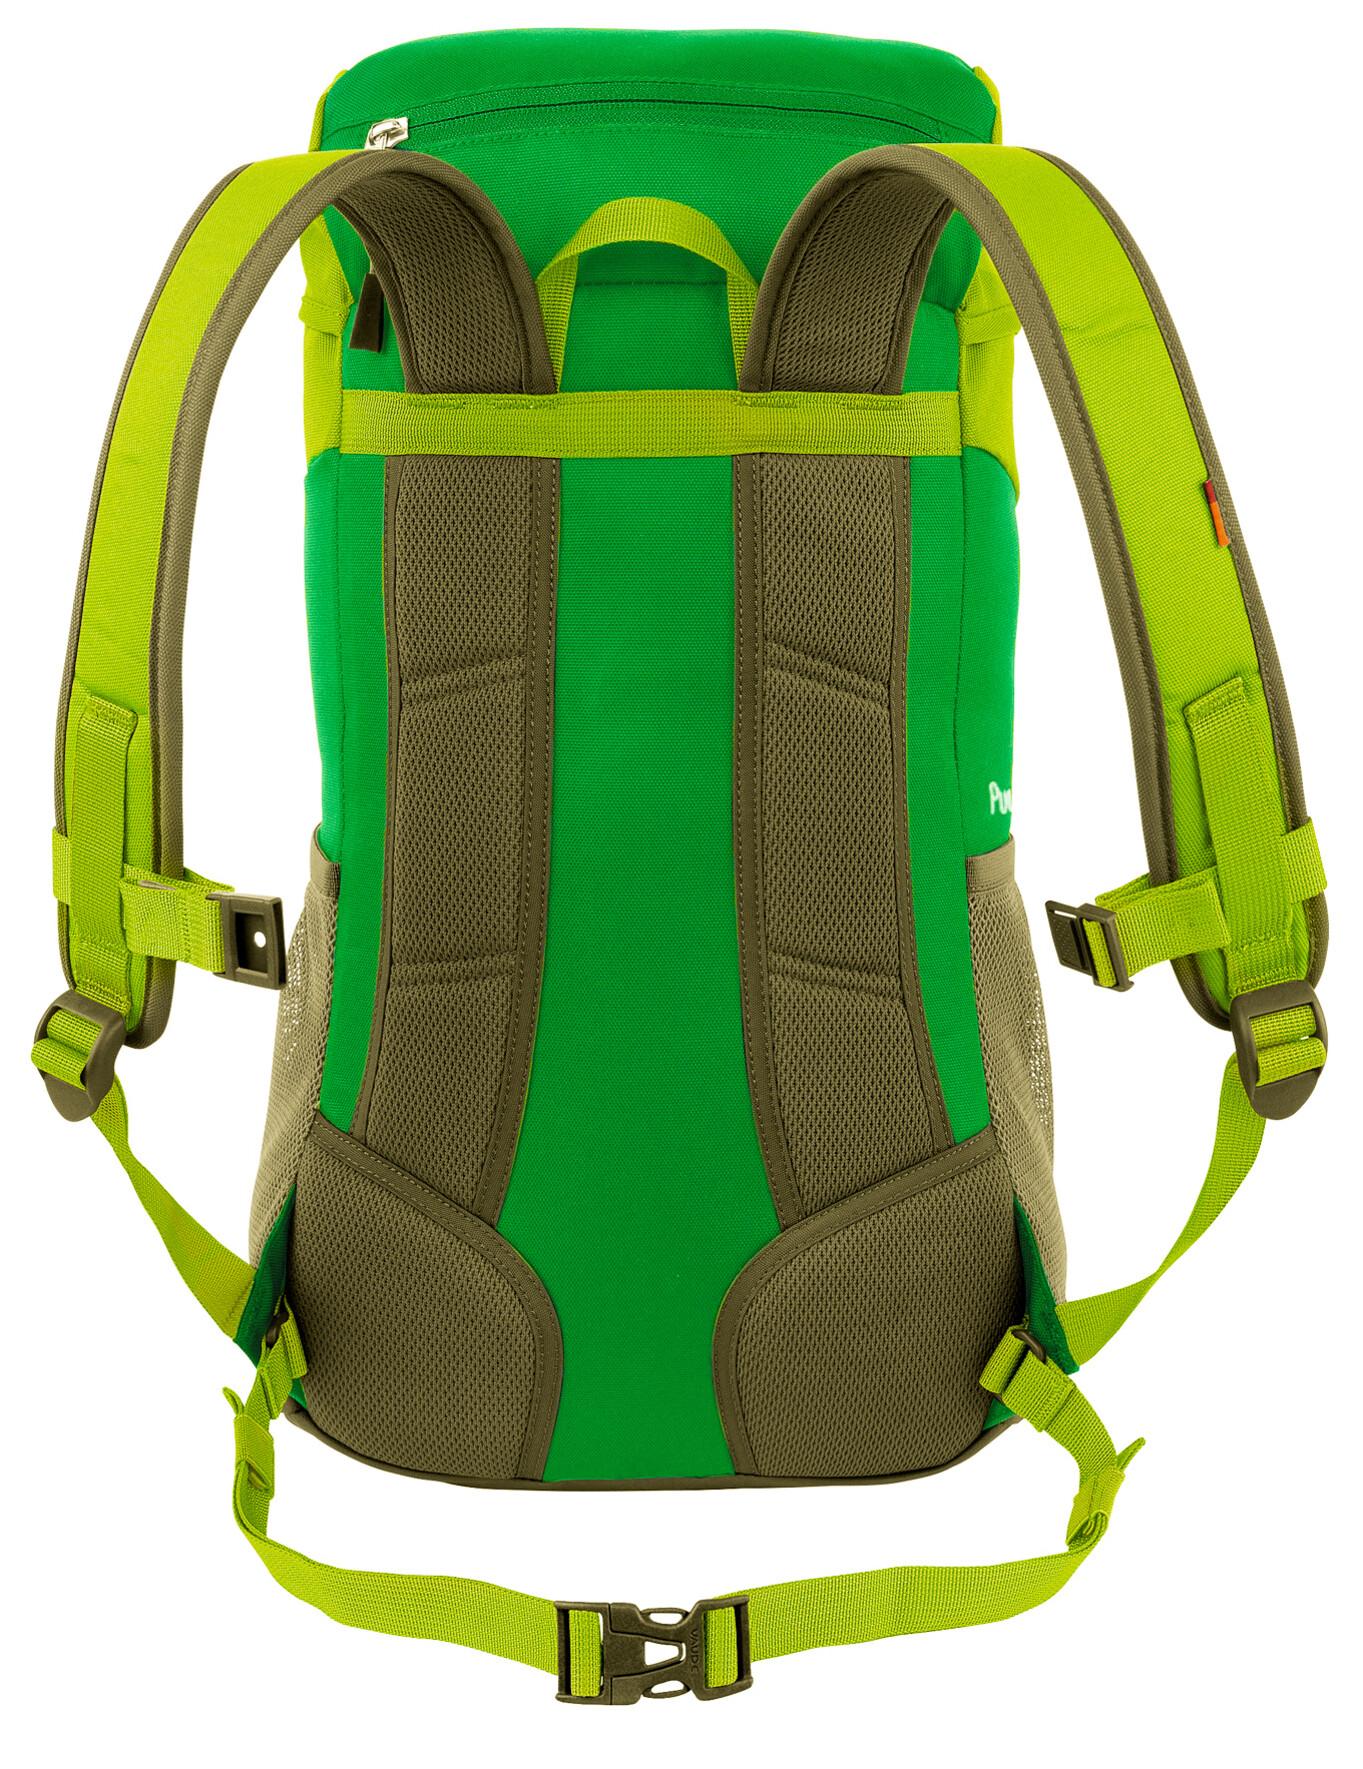 VAUDE Puck 10 Backpack Children green at Addnature.co.uk 0dd2536d52216